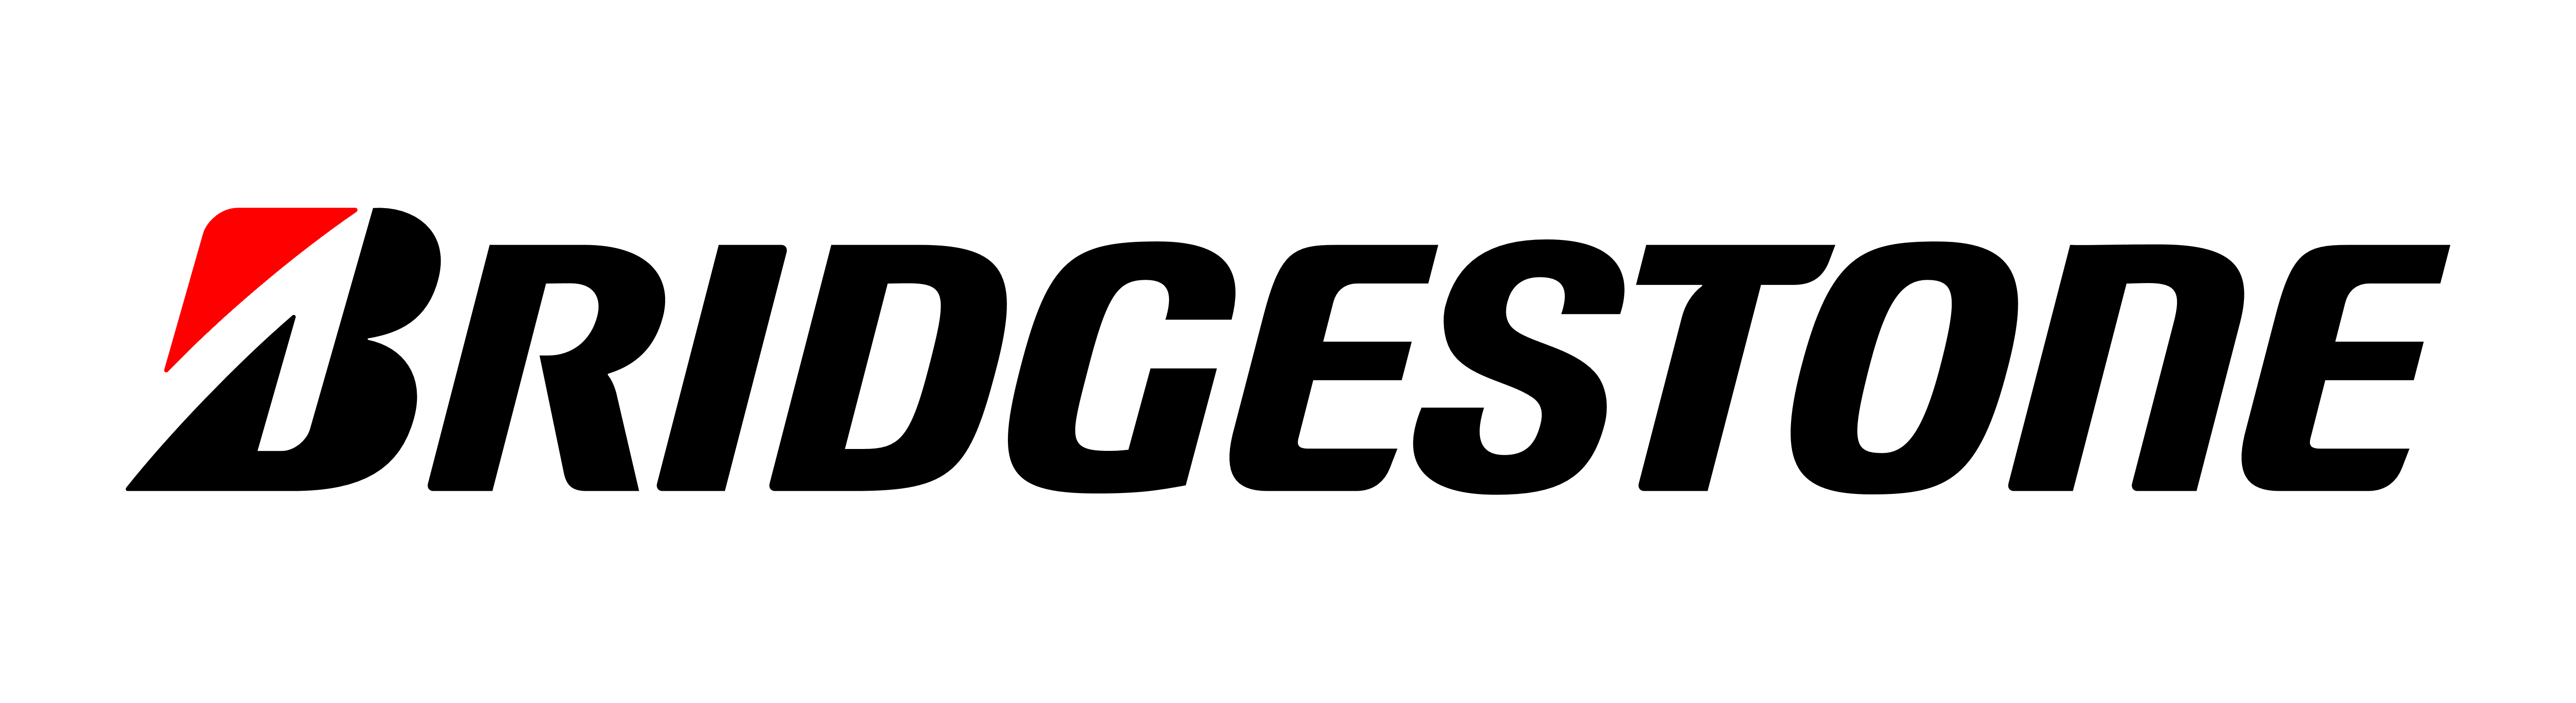 bridgestone logo hd png information carlogosorg